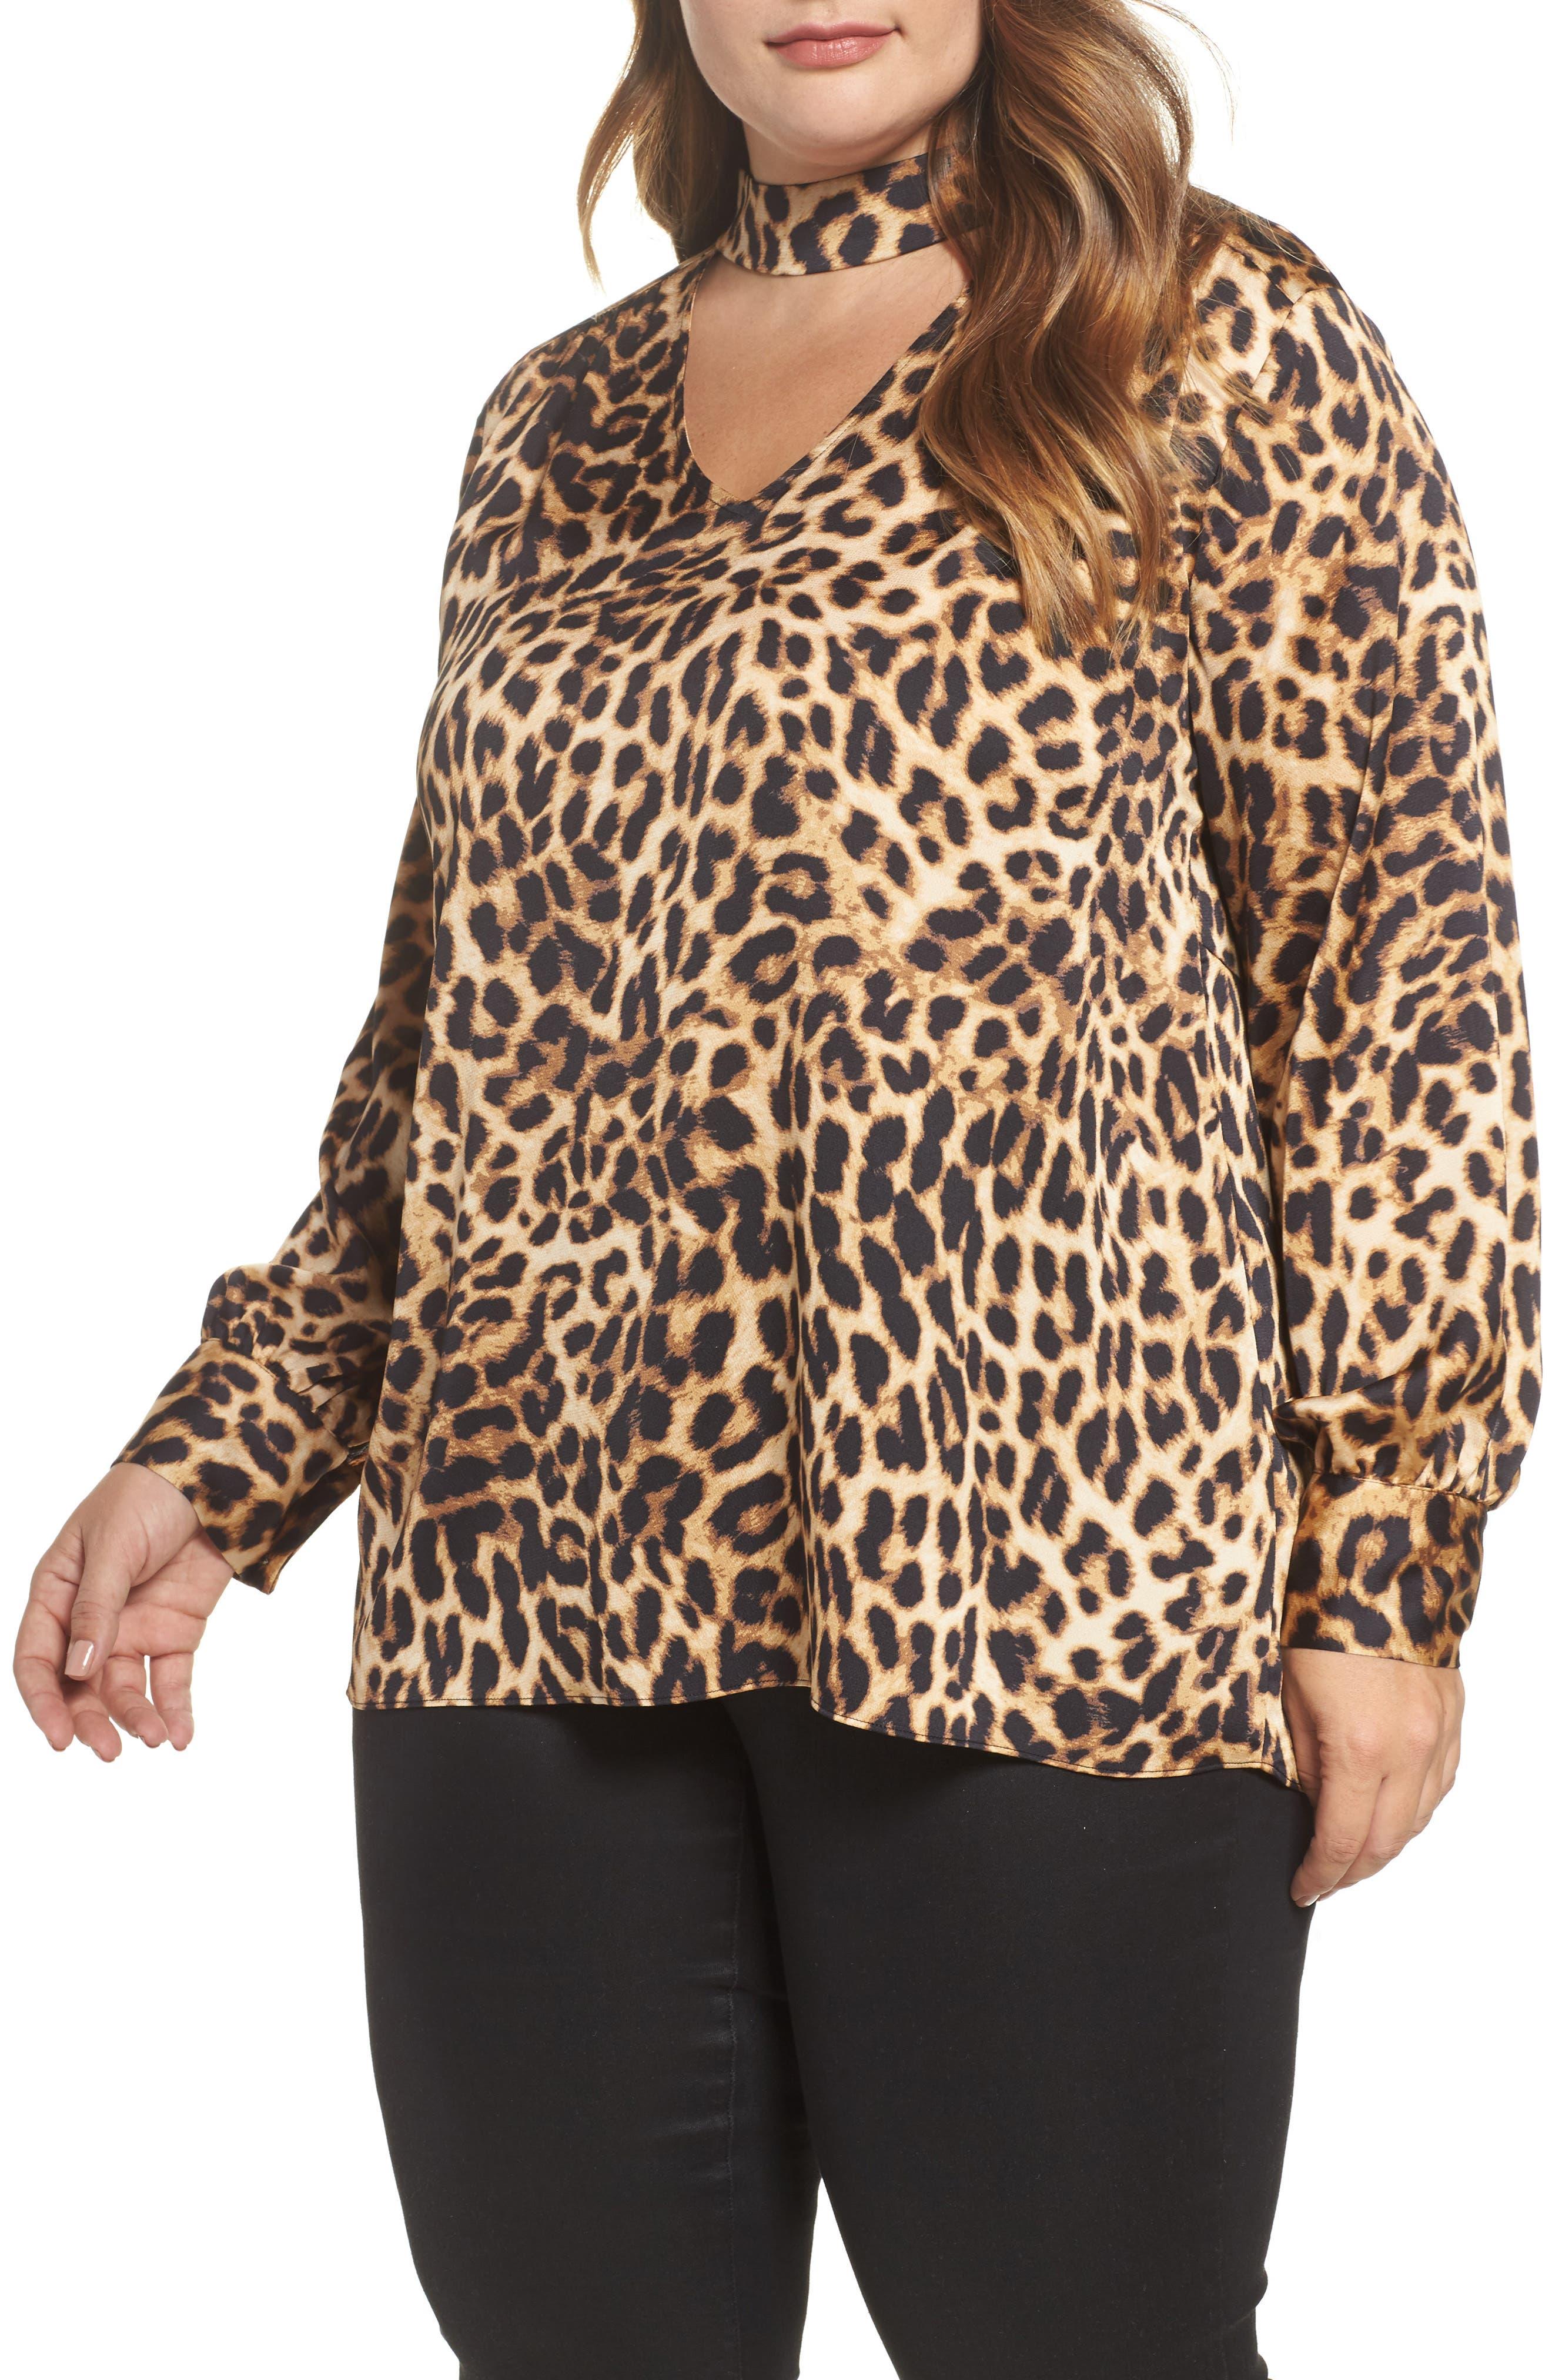 Main Image - Vince Camuto Mock Choker Neck Leopard Print Top (Plus Size)